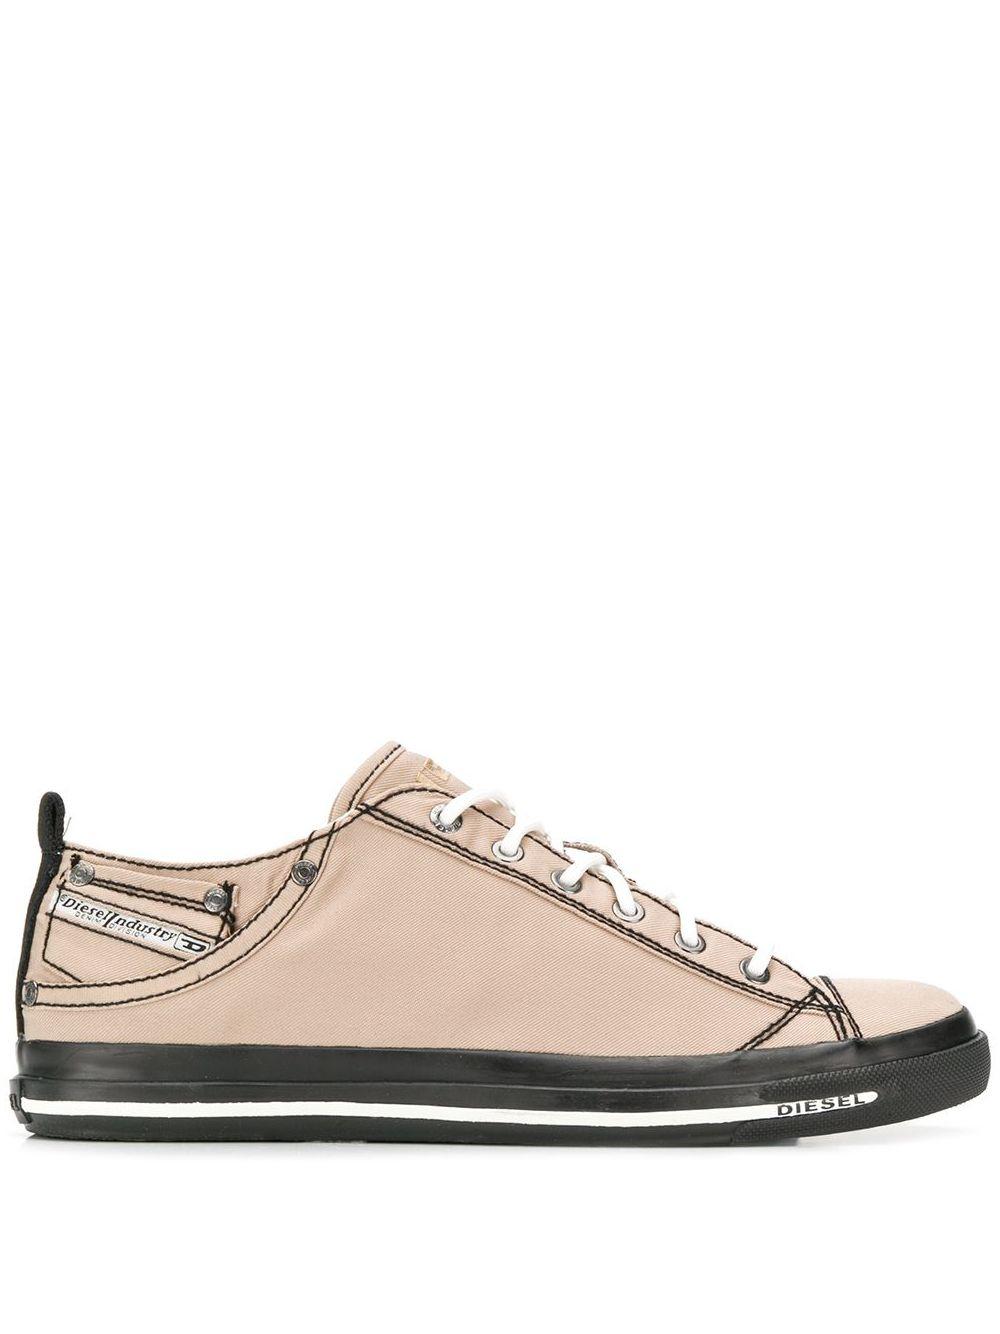 DIESEL | кеды на шнуровке | Clouty